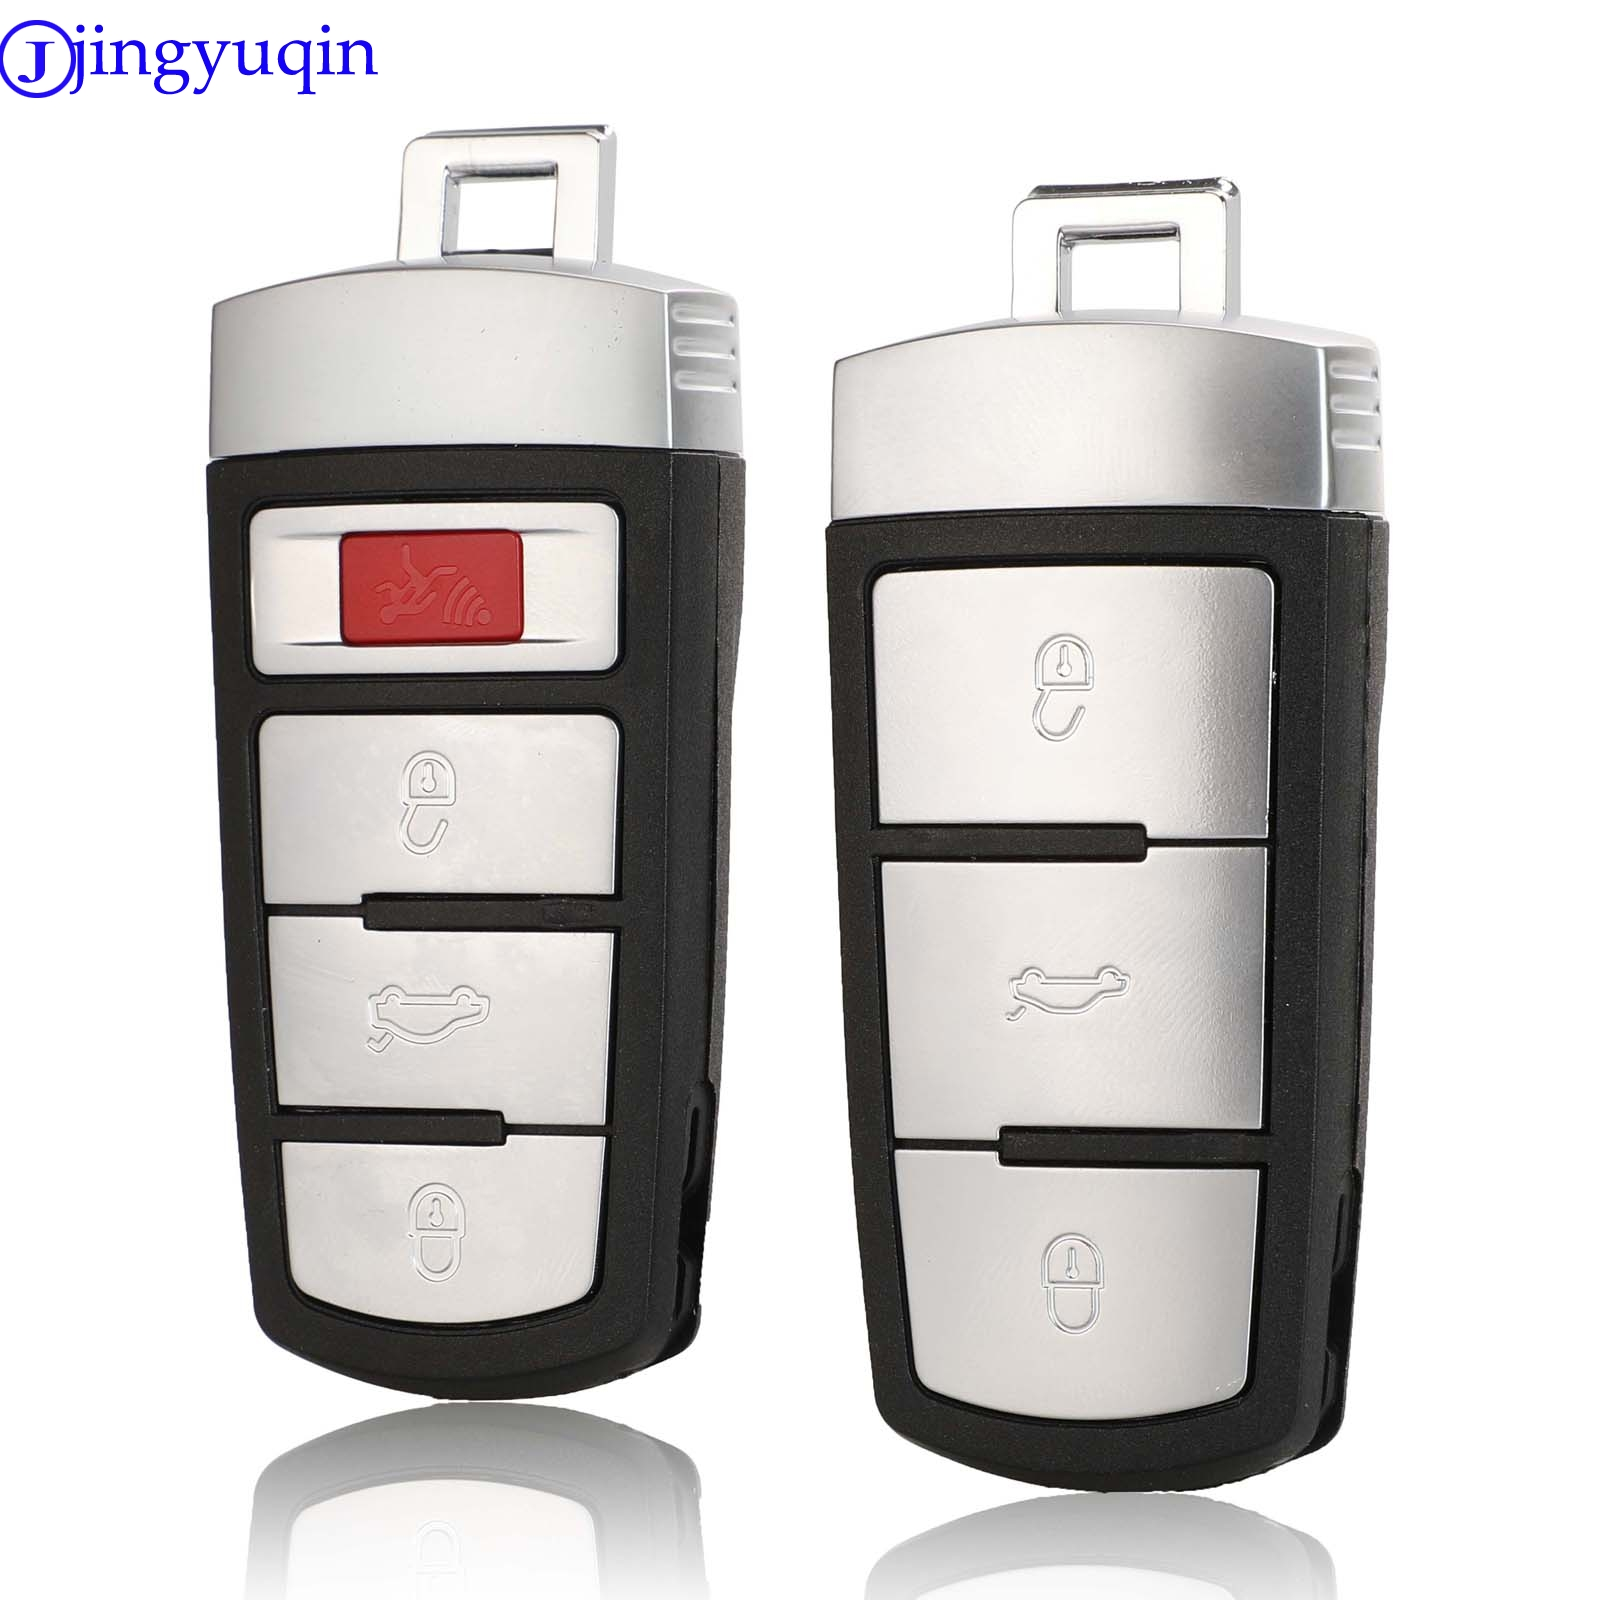 Jingyuqin Remote 4 Buttons Car Key Case For Volkswagen VW Passat CC B6 B7 B7L CC R36 Maogotan B5 Passat 3C Car Key Shell